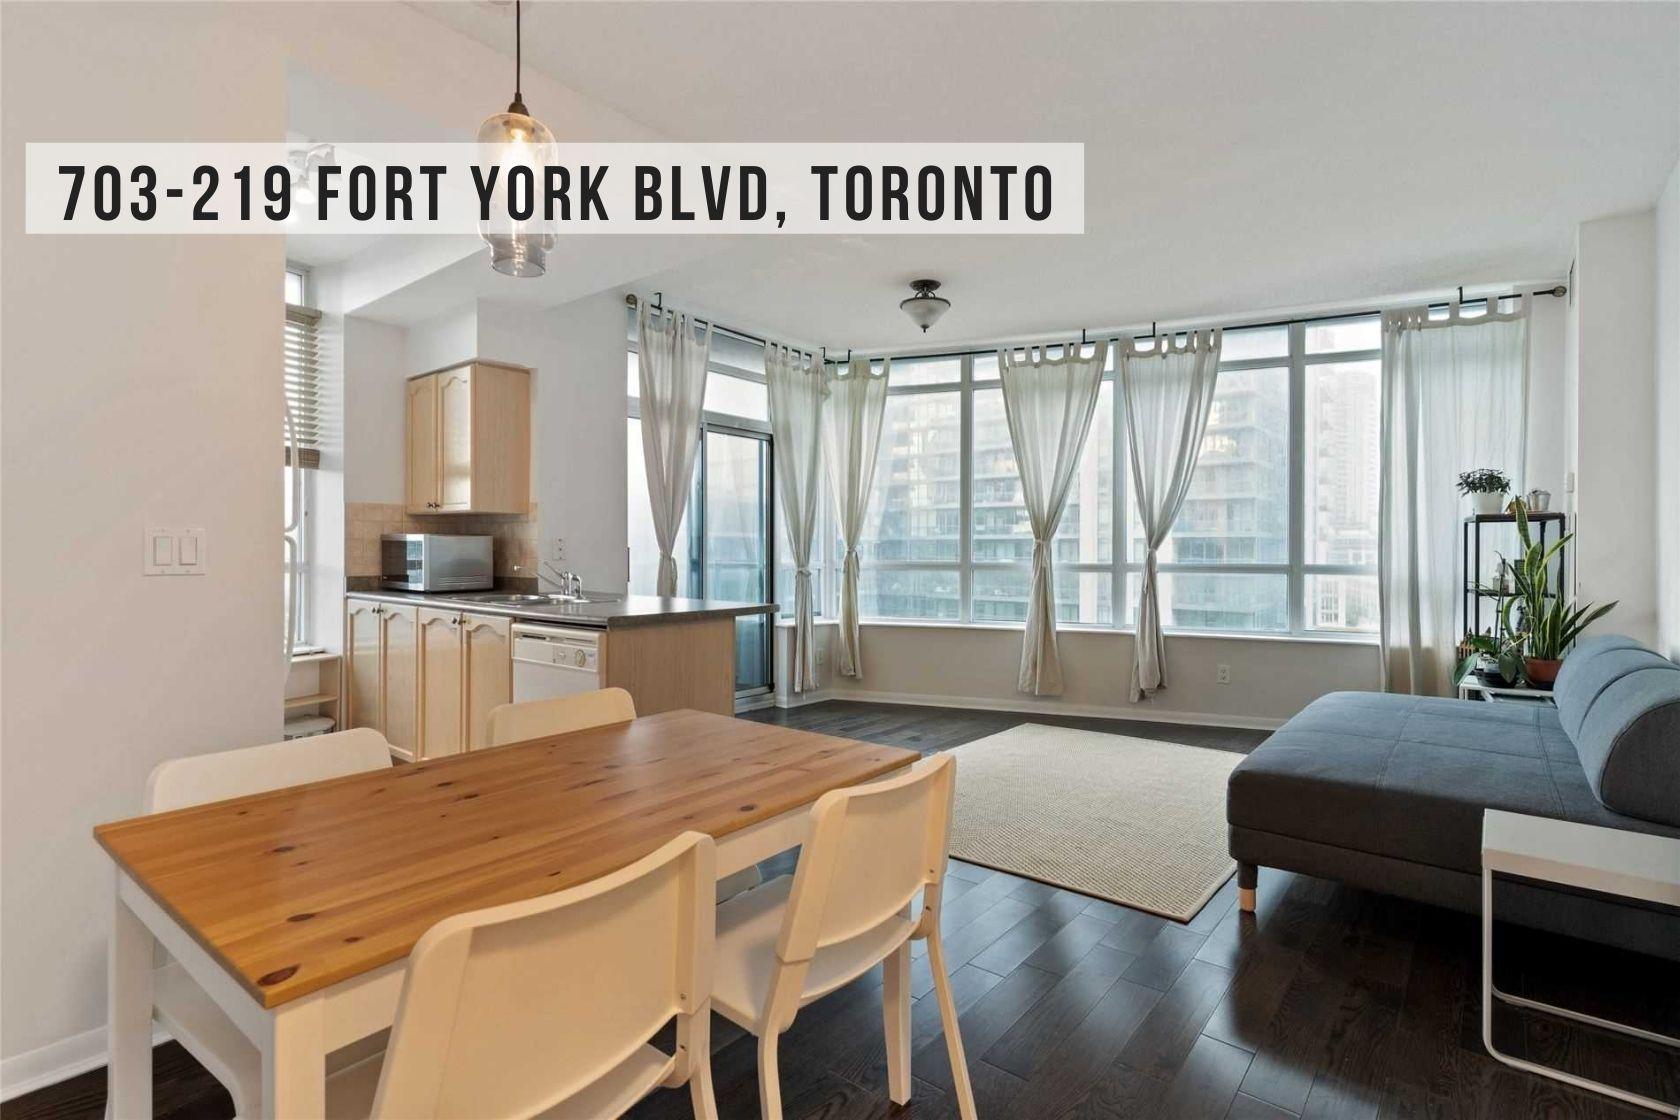 $728,000 • 219 Fort York Blvd